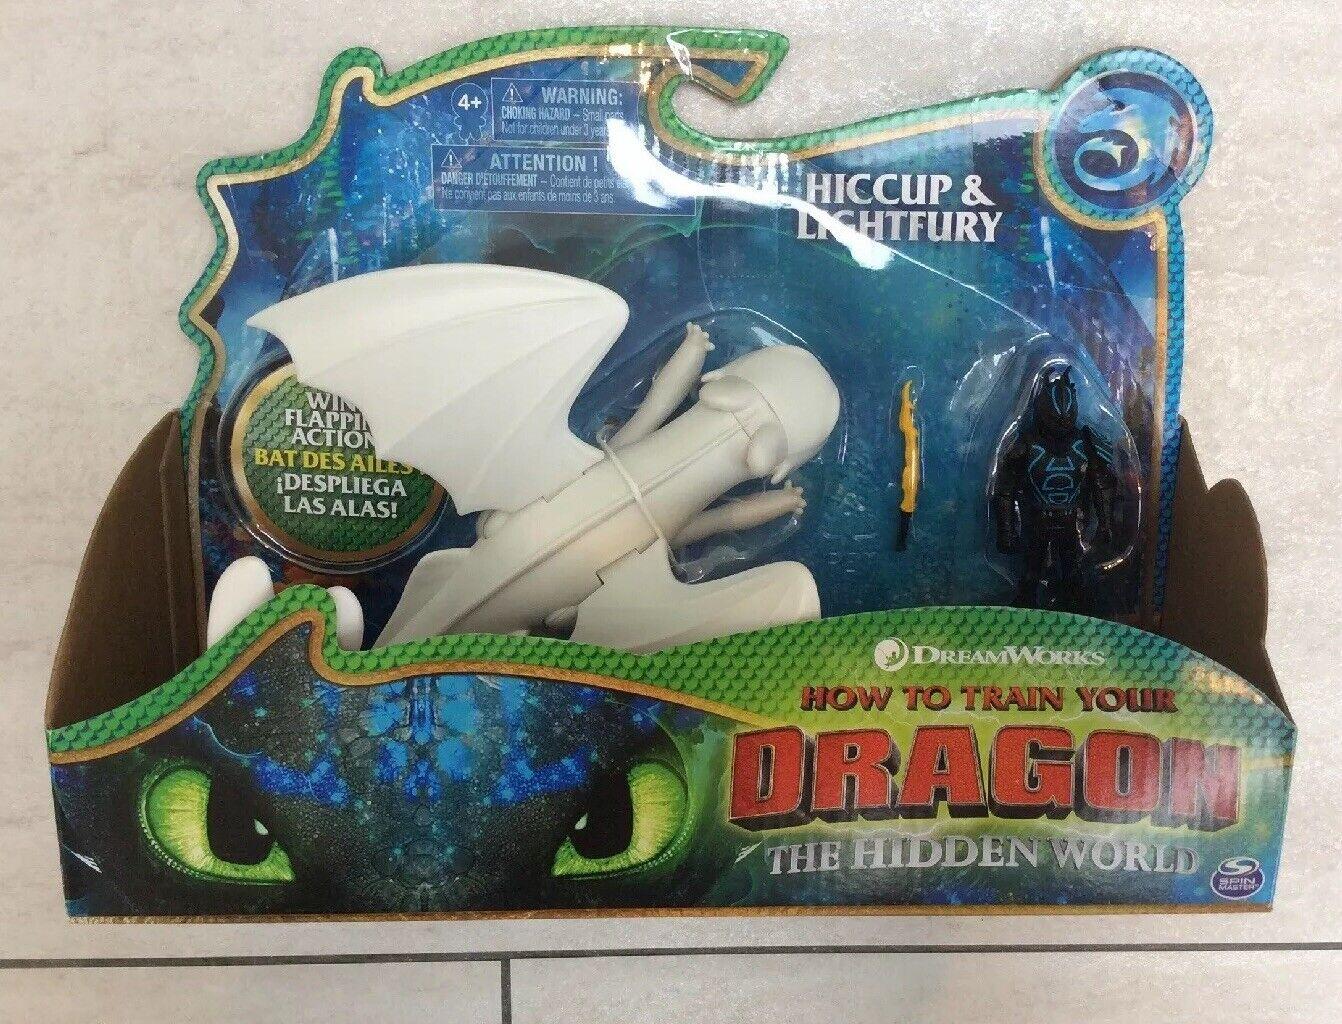 How To Train Your Dragon the Hidden World hiccup & Lightfury Set. BNIB